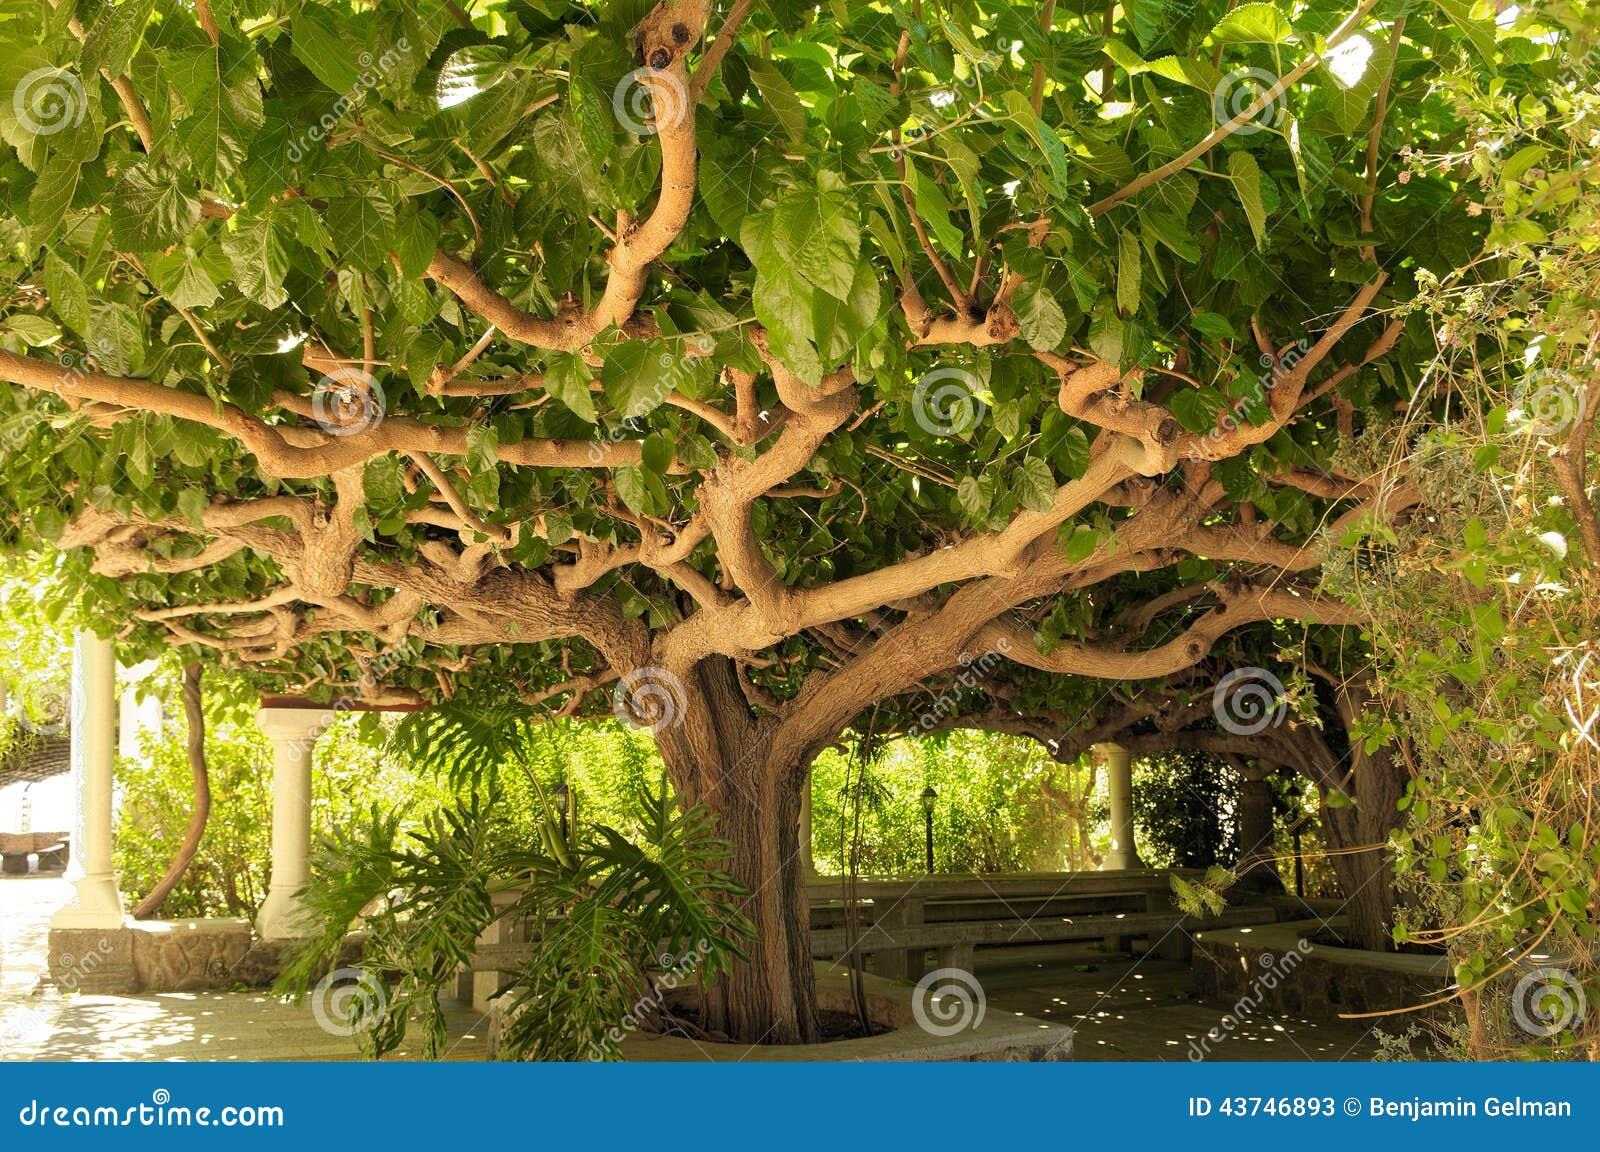 kiwi tree image stock. image du objets, arbre, été, vert - 43746893